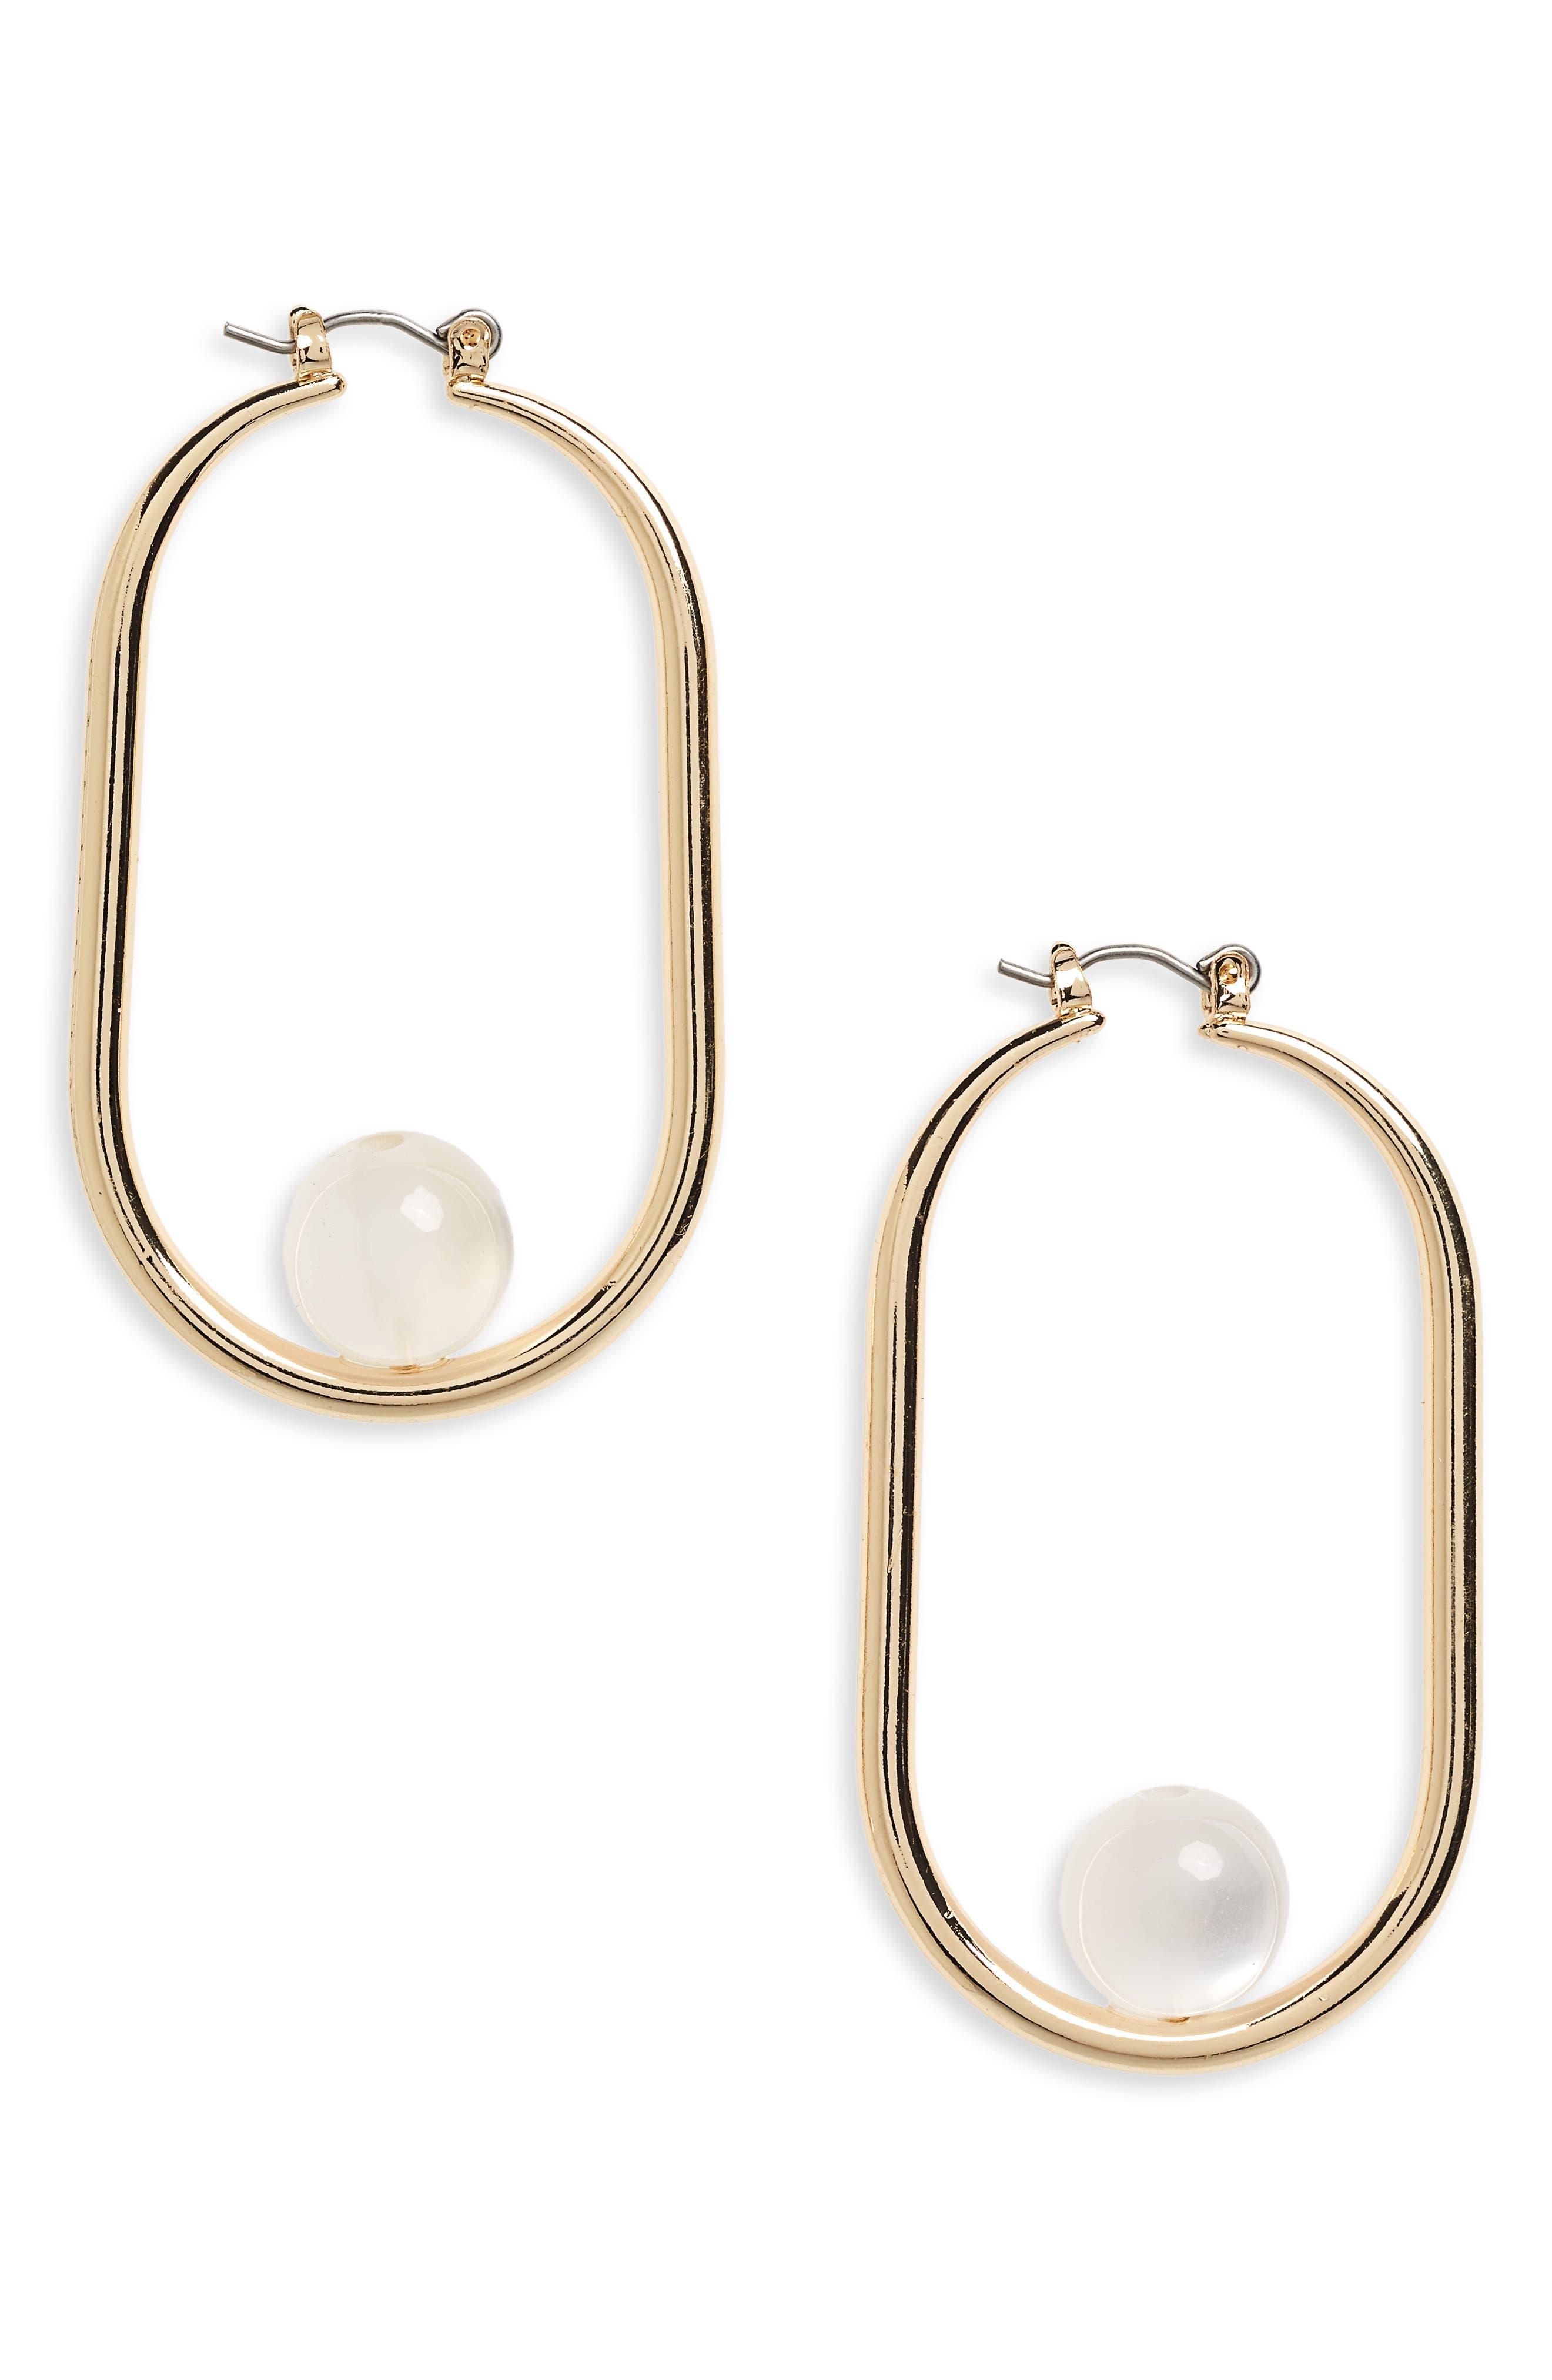 Marble Bead Hoop Earrings,                             Main thumbnail 1, color,                             Gold/ Cream